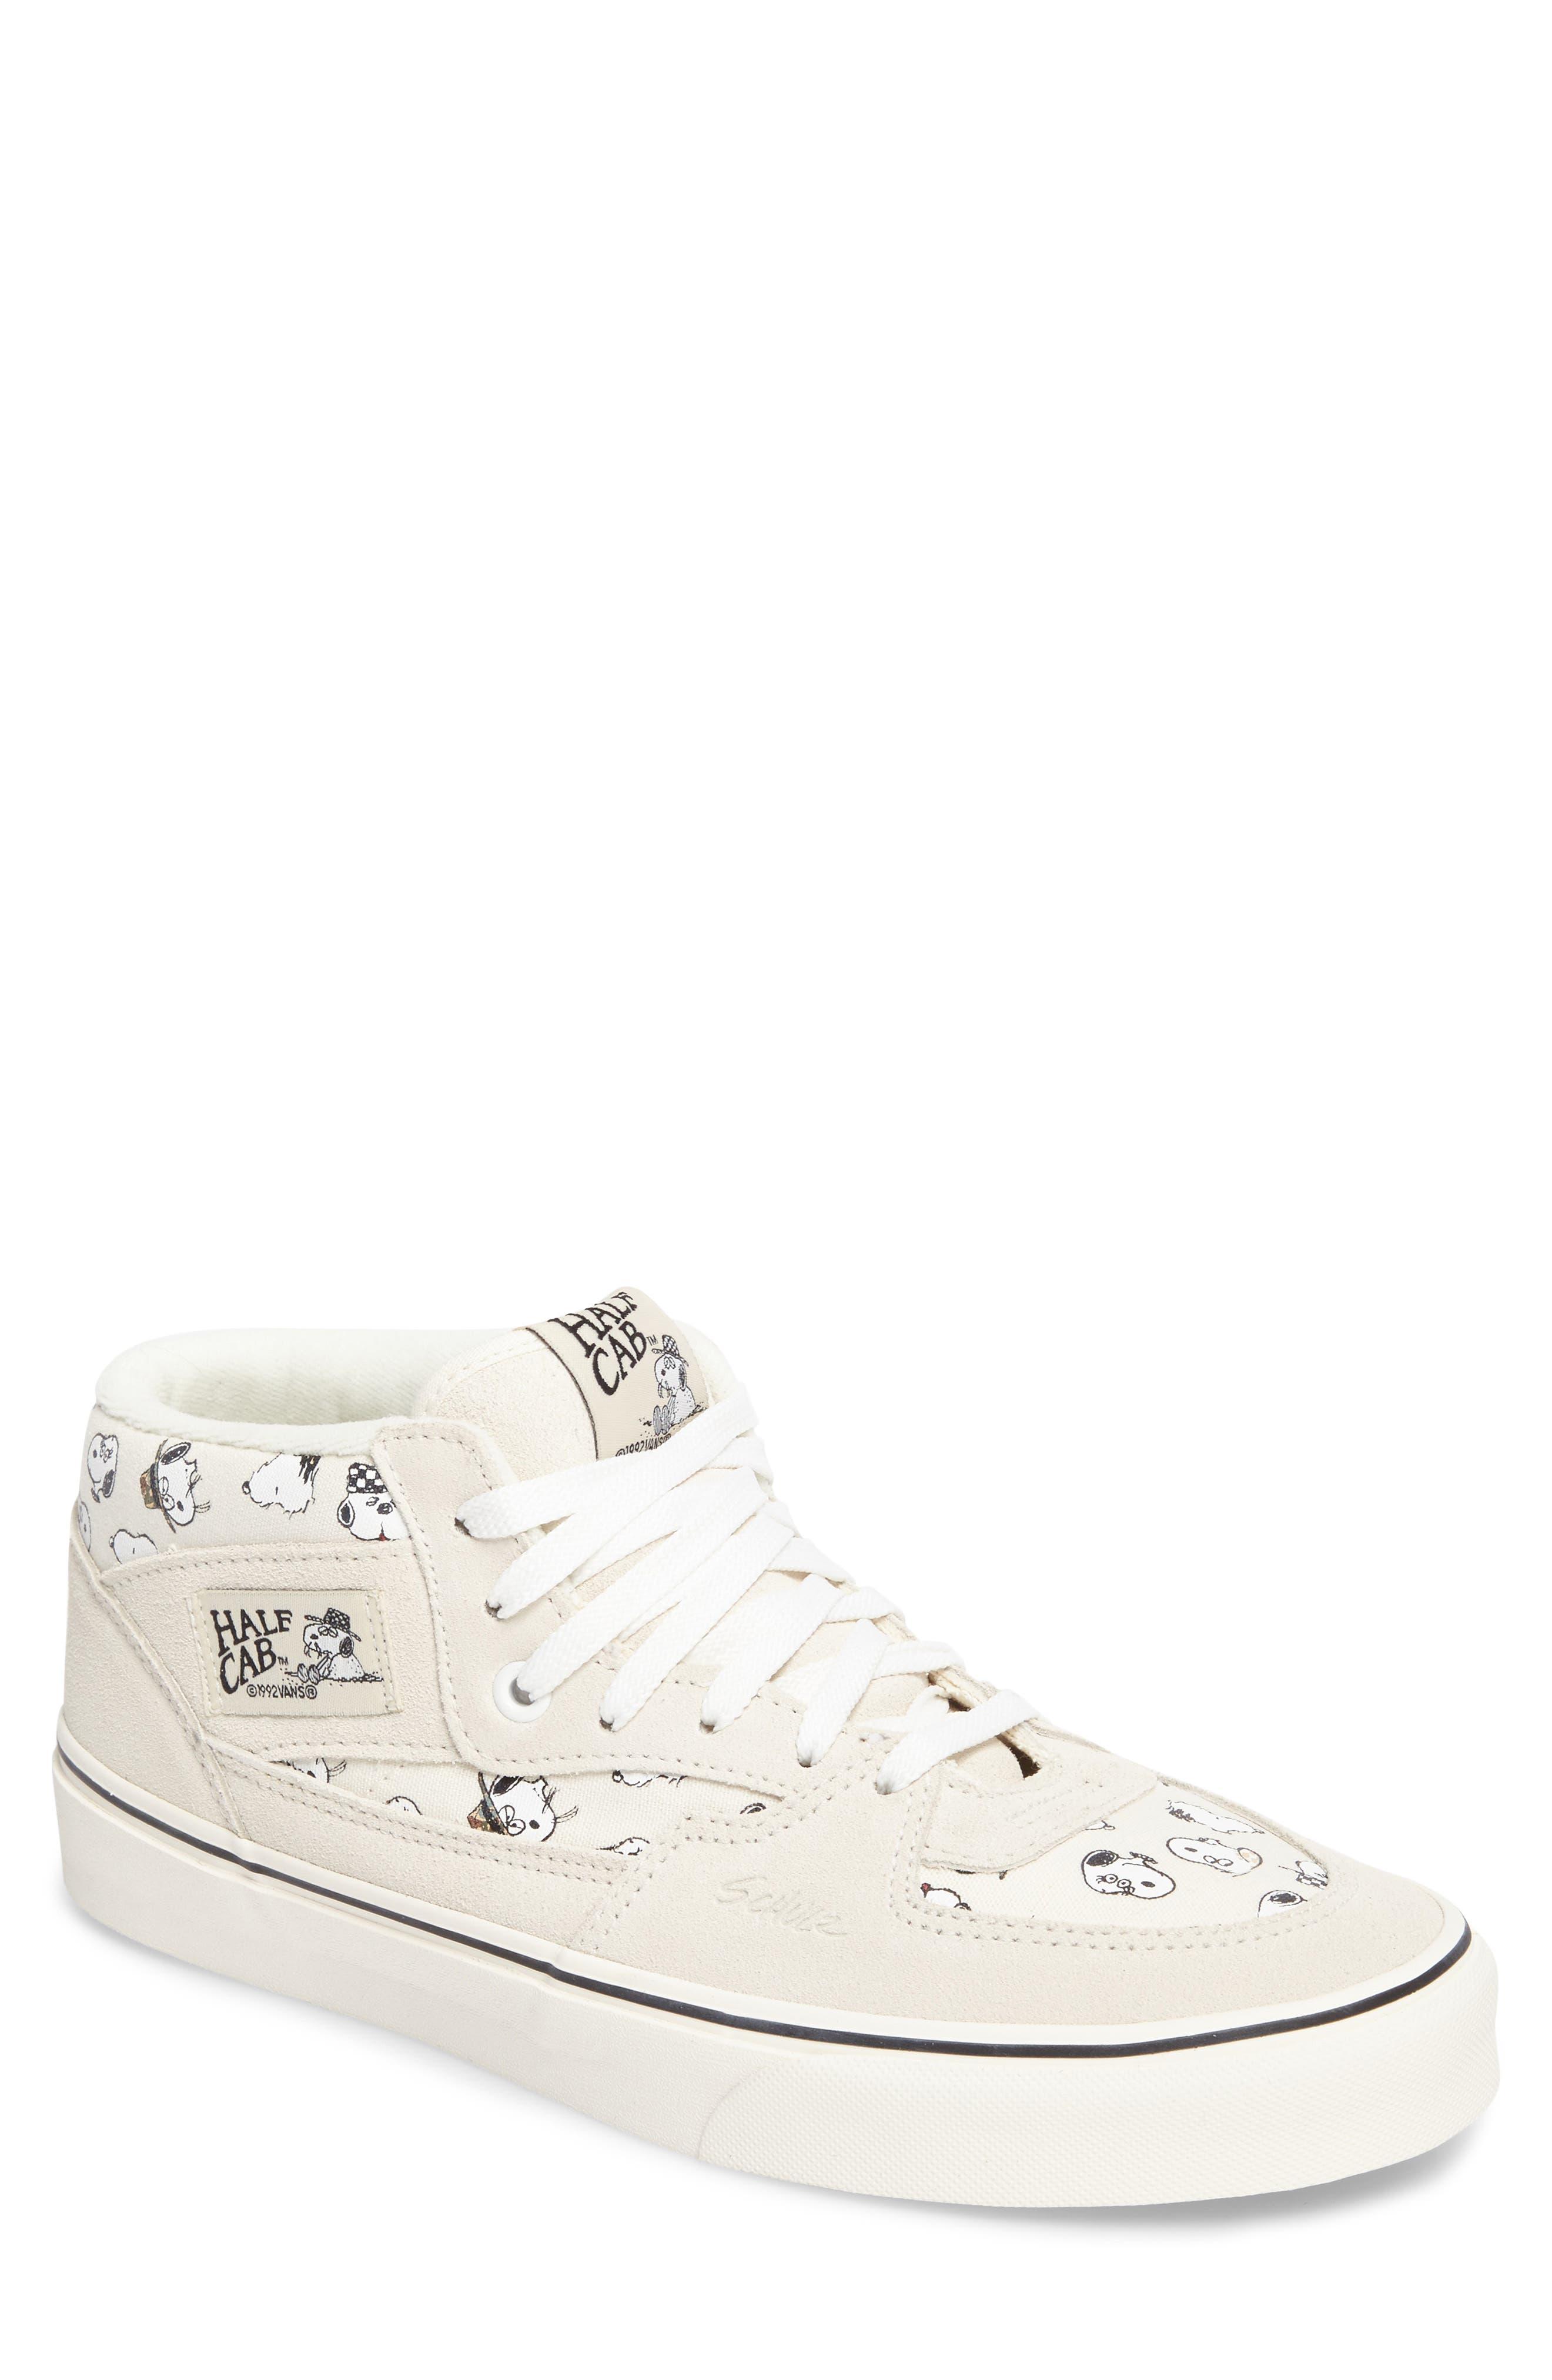 x Peanuts<sup>®</sup> Half Cab Sneaker,                             Main thumbnail 1, color,                             100